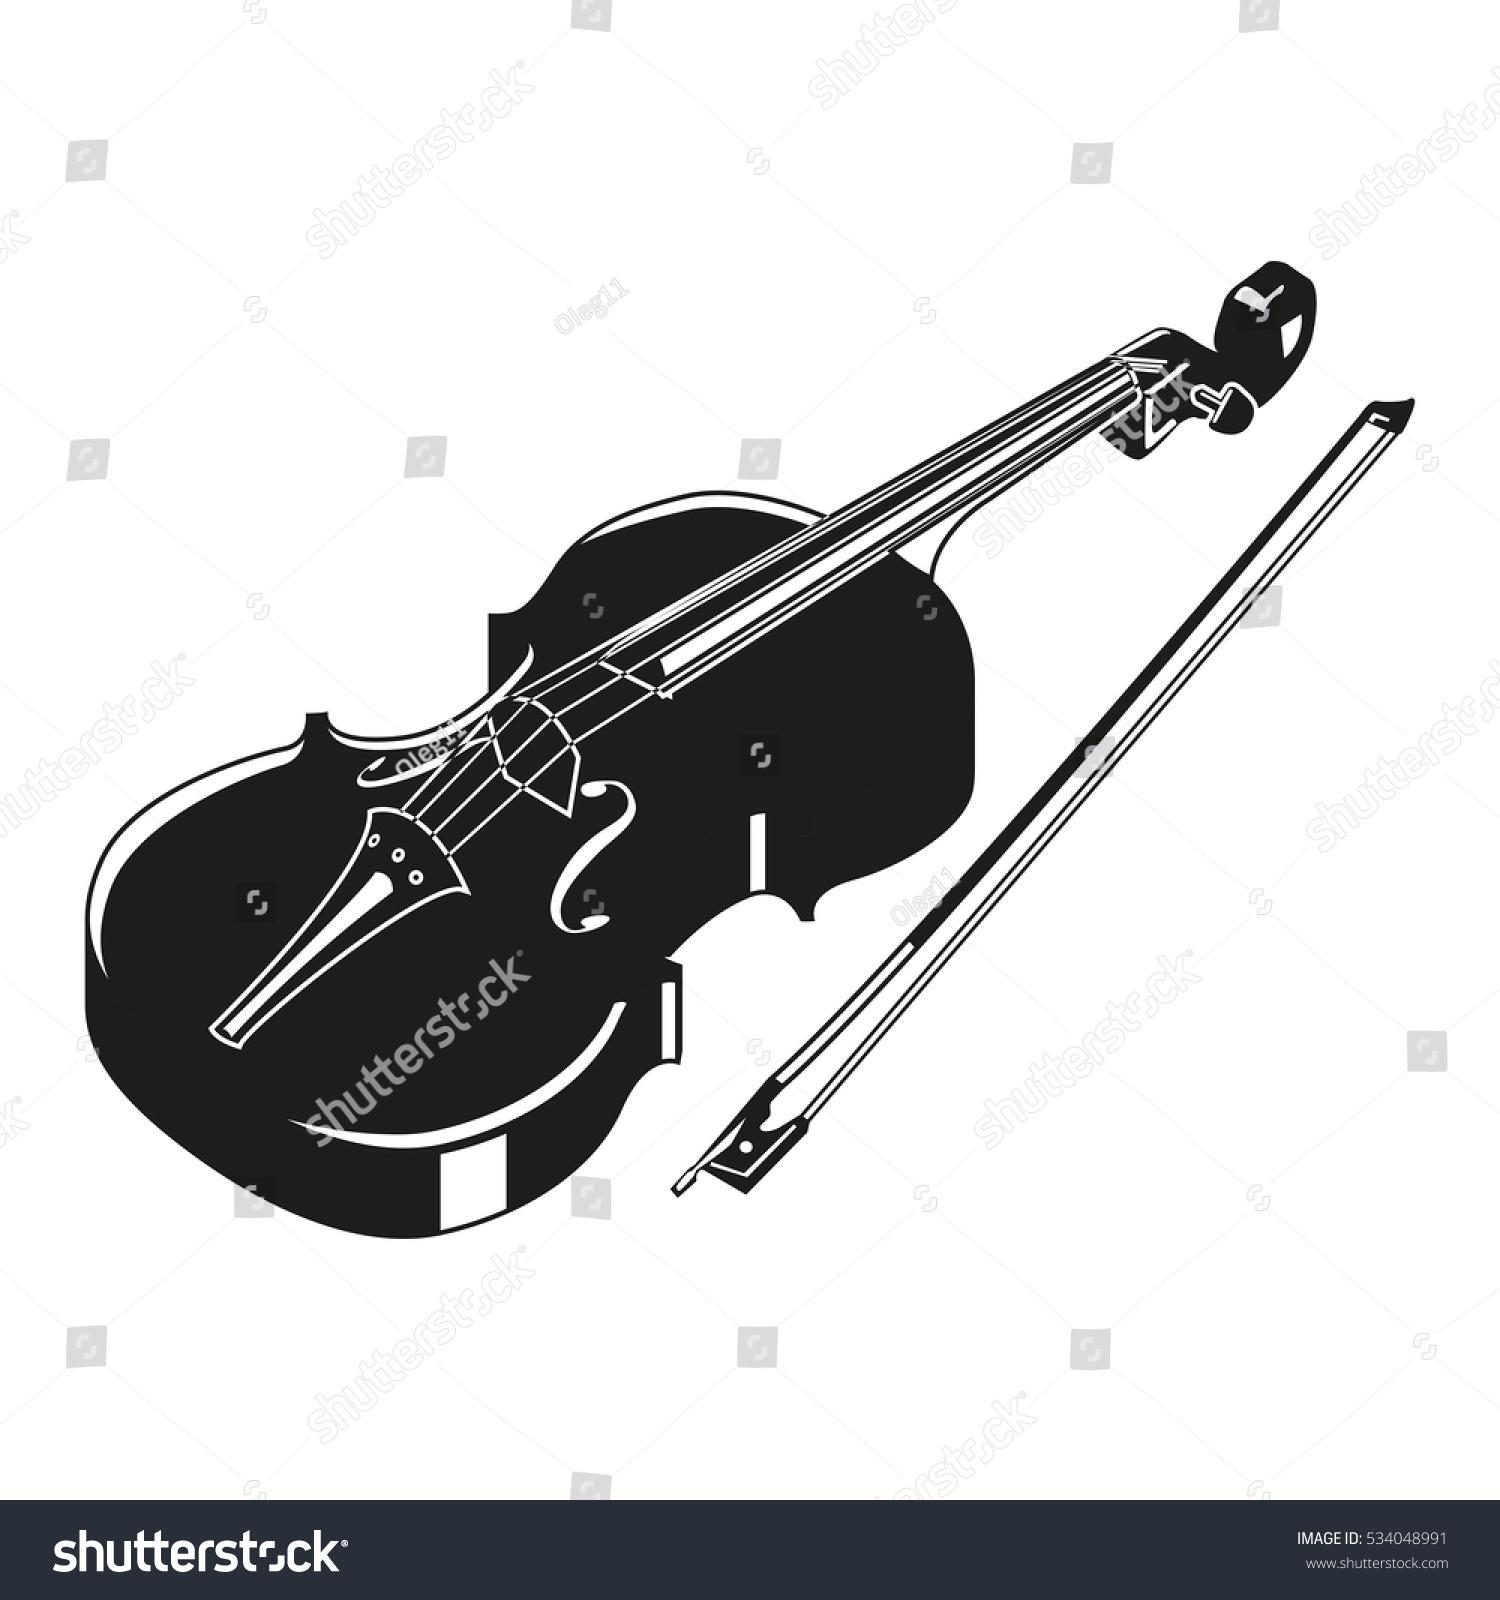 Violin Silhouette Related Keywords - Violin Silhouette ...